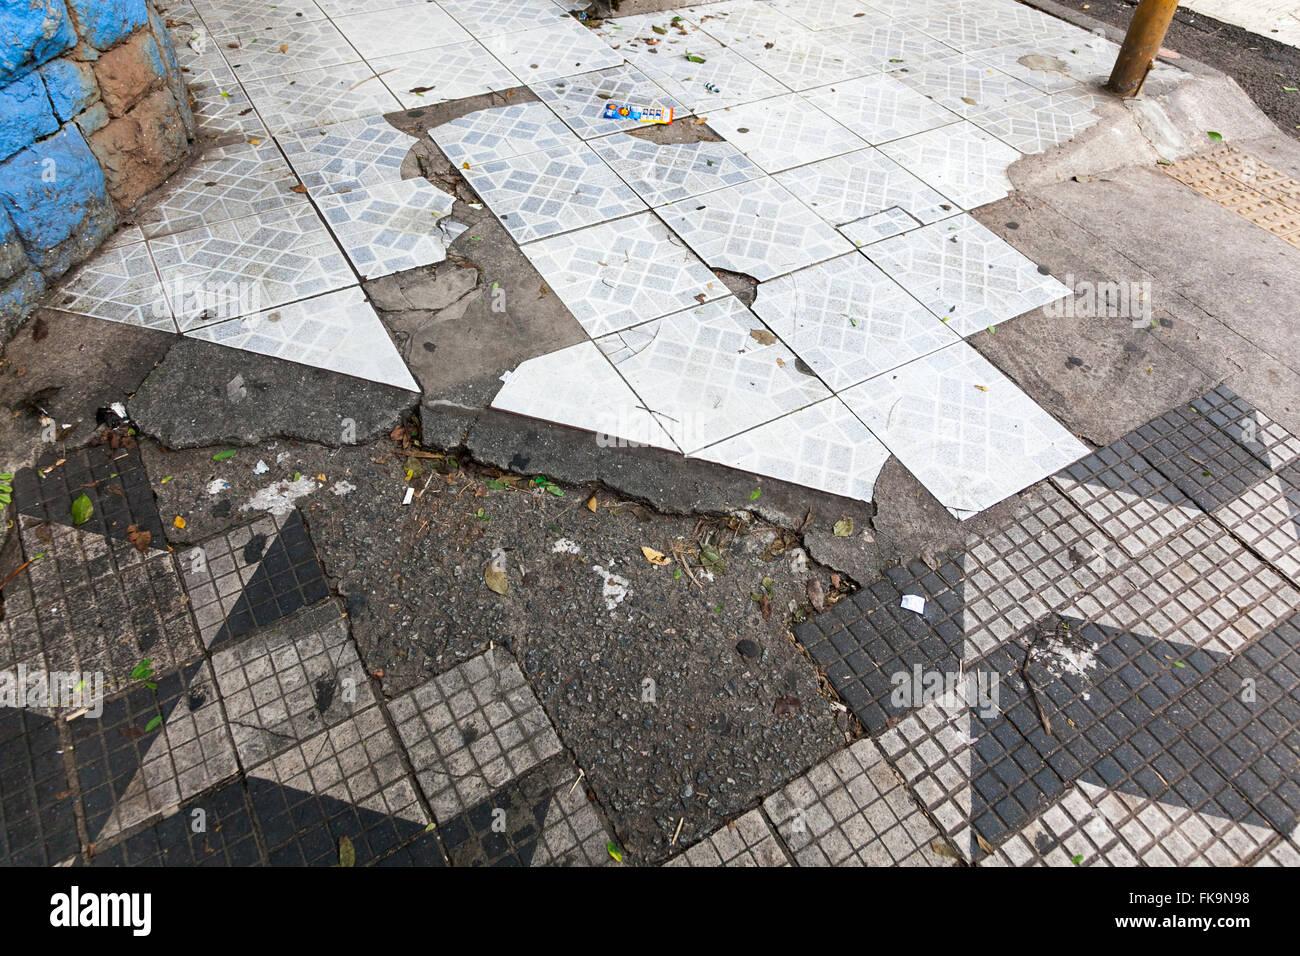 Run down pavements in Sao Paulo, Brazil - Stock Image